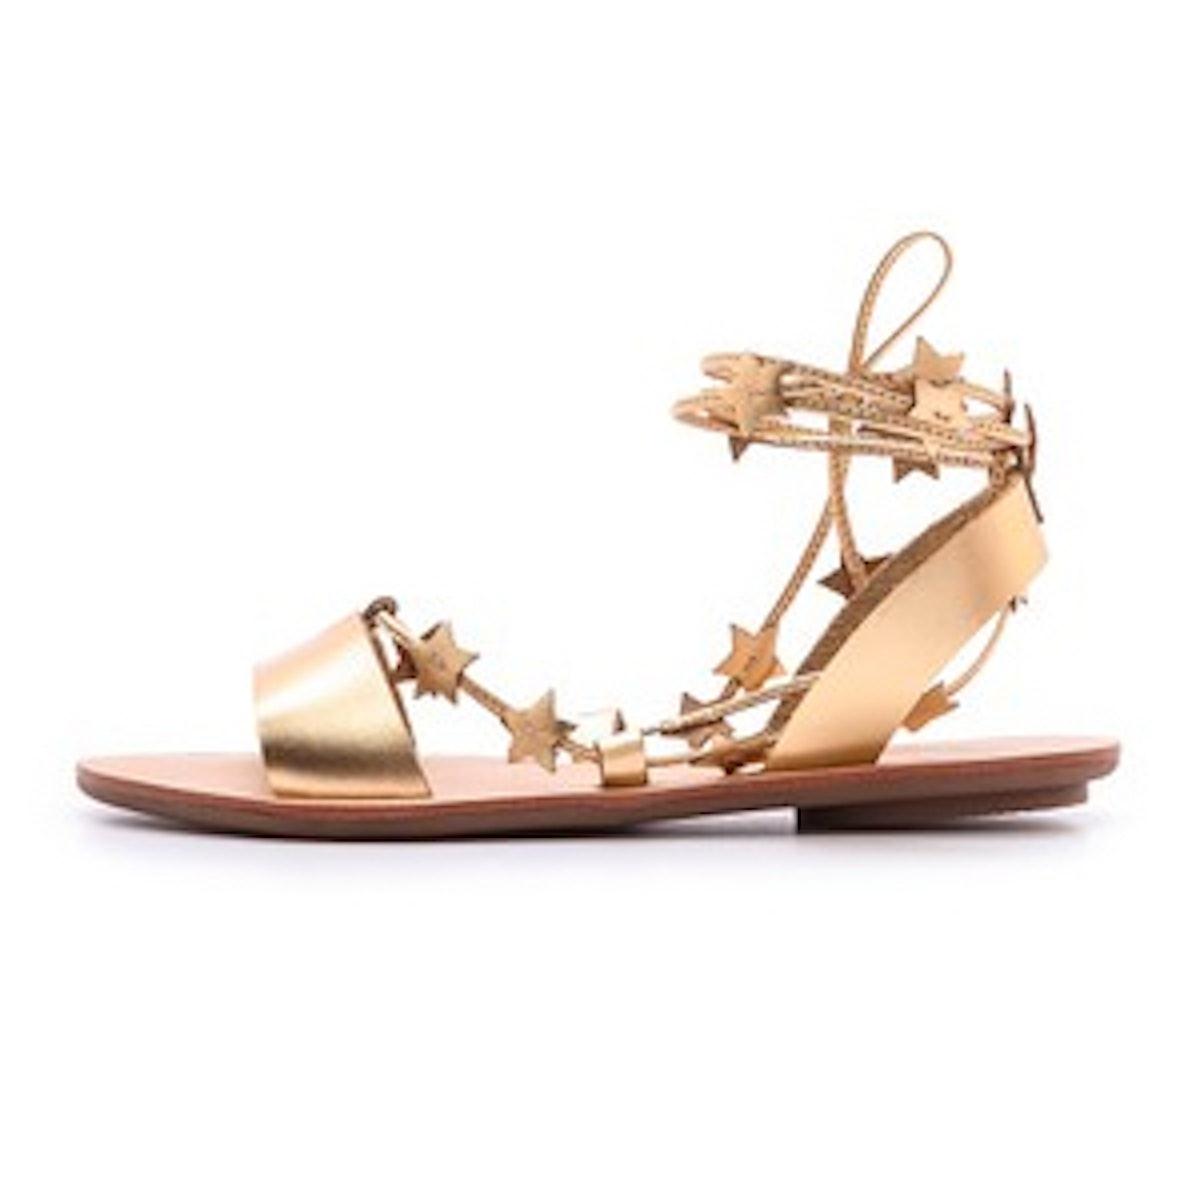 Starla Sandals